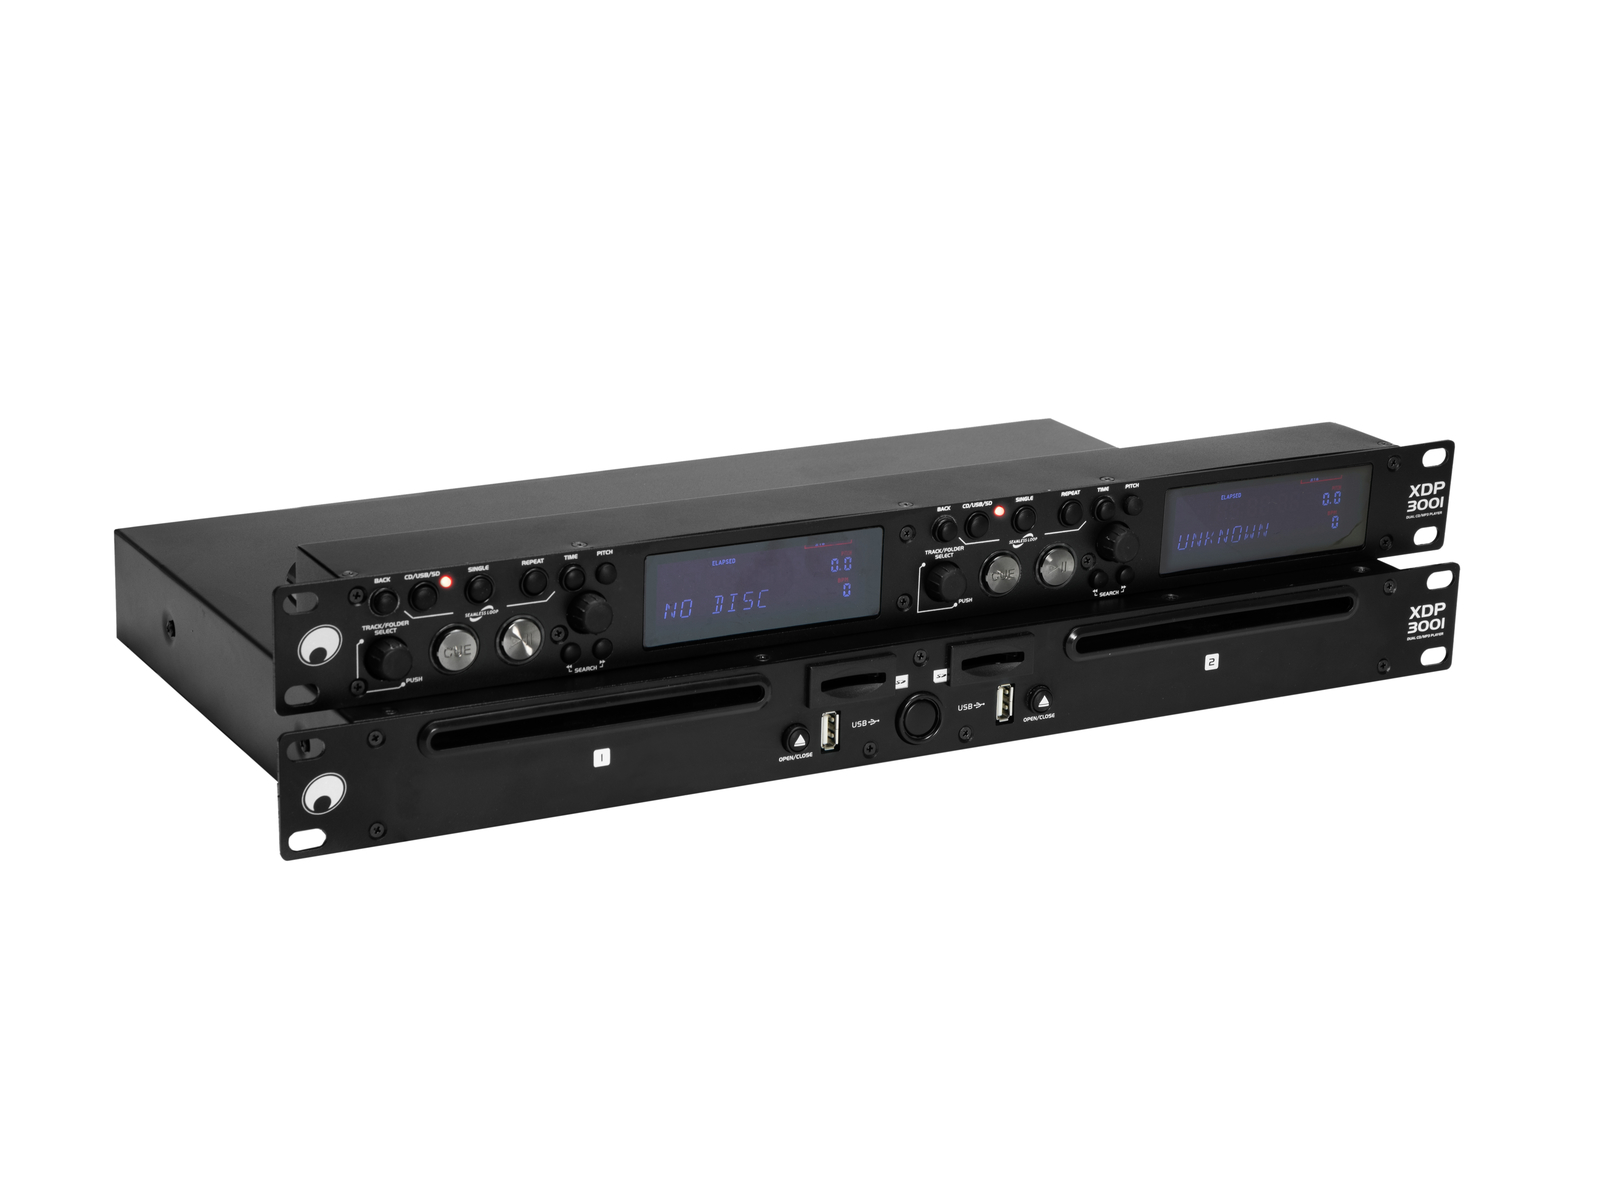 OMNITRONIC XDP-3001 CD-/MP3-Player